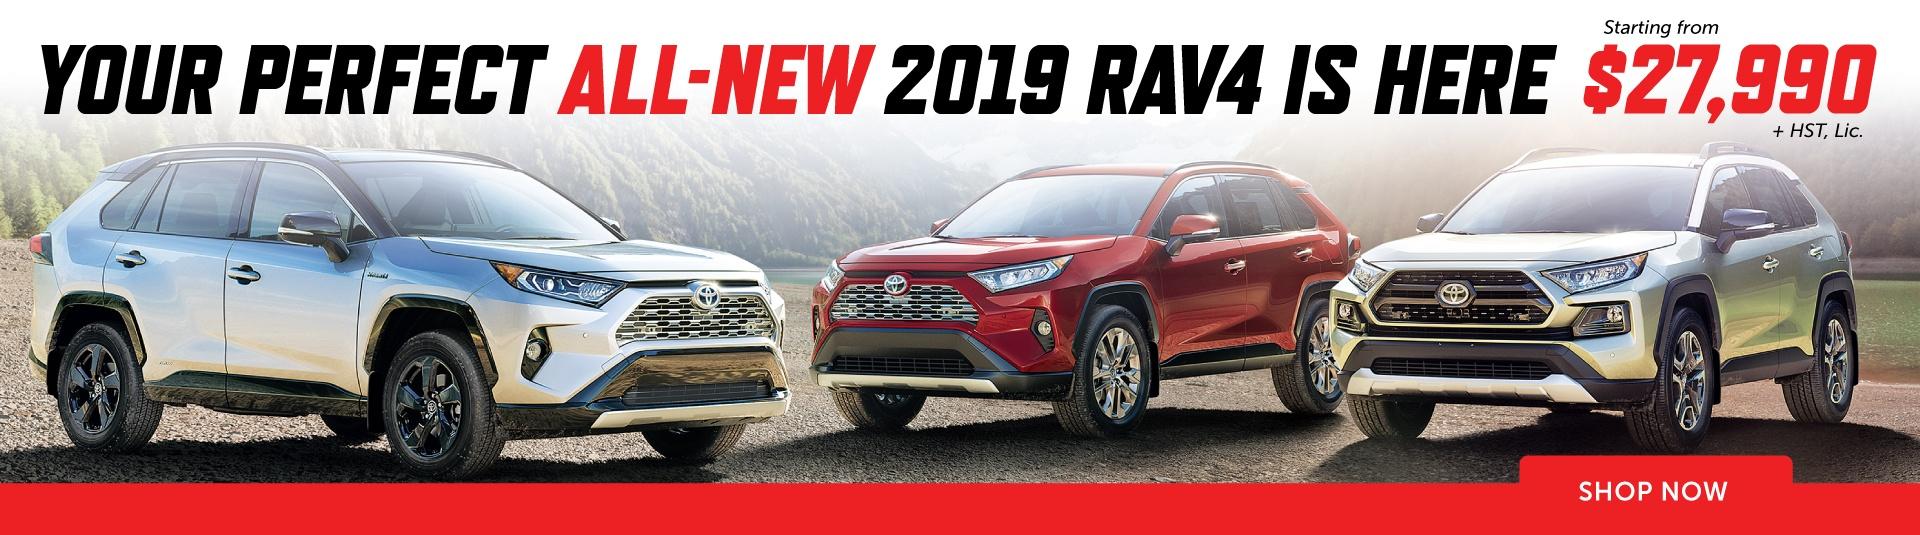 https://www.georgetowntoyota.com/new/2019-Toyota-RAV4.html